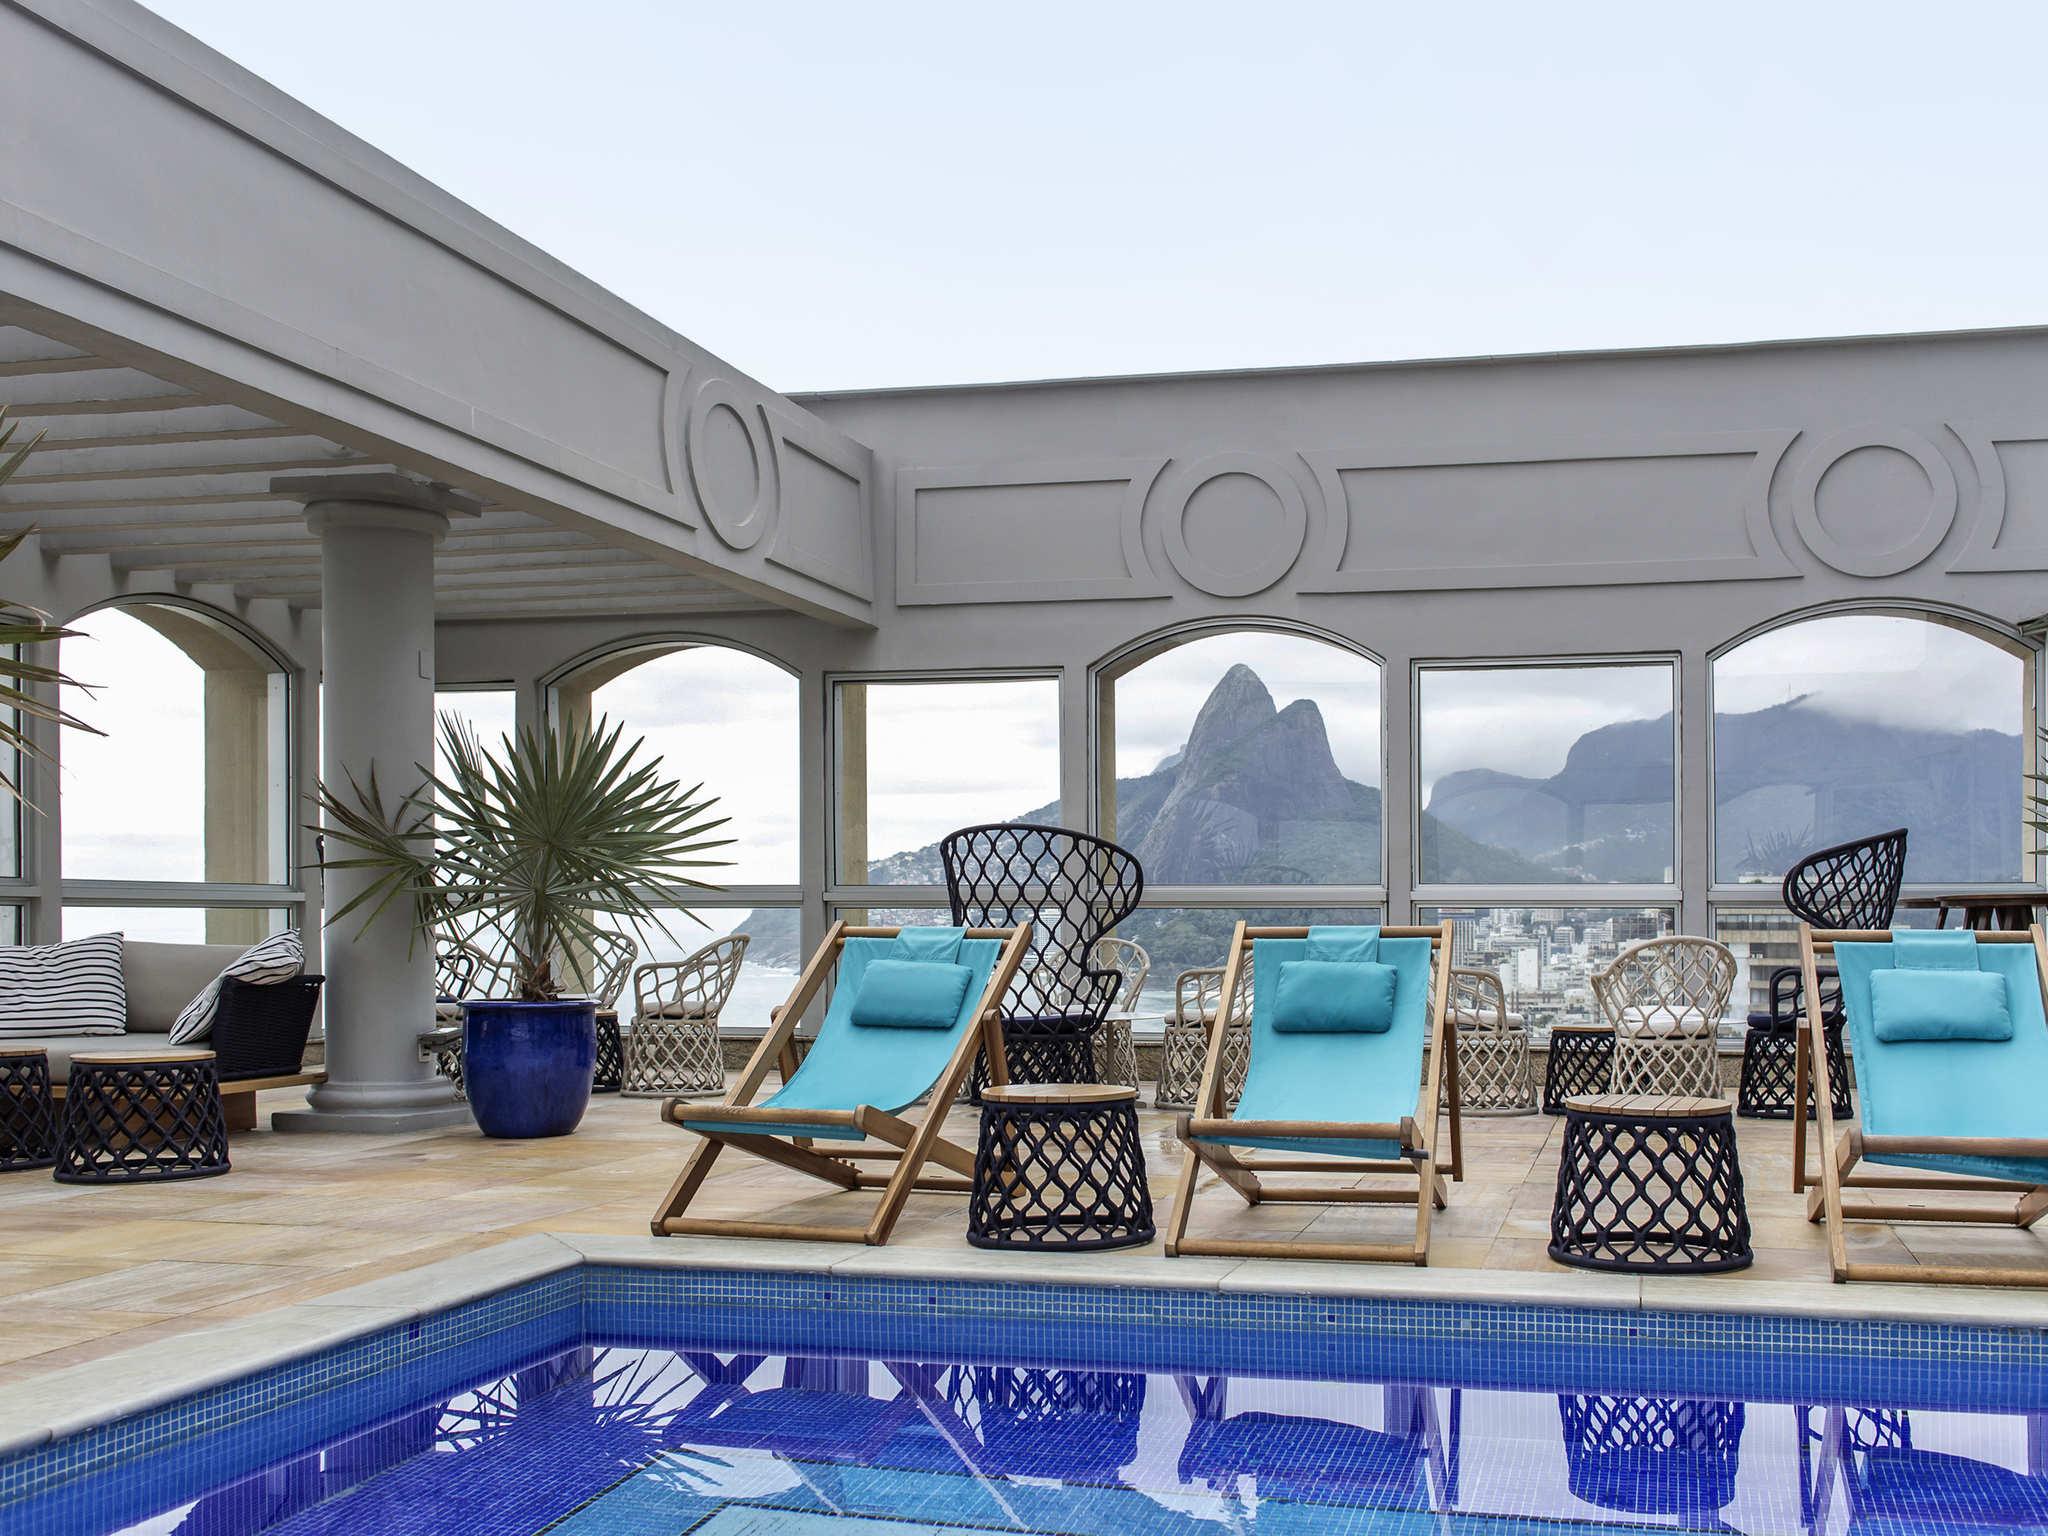 Hôtel - Sofitel Rio de Janeiro Ipanema